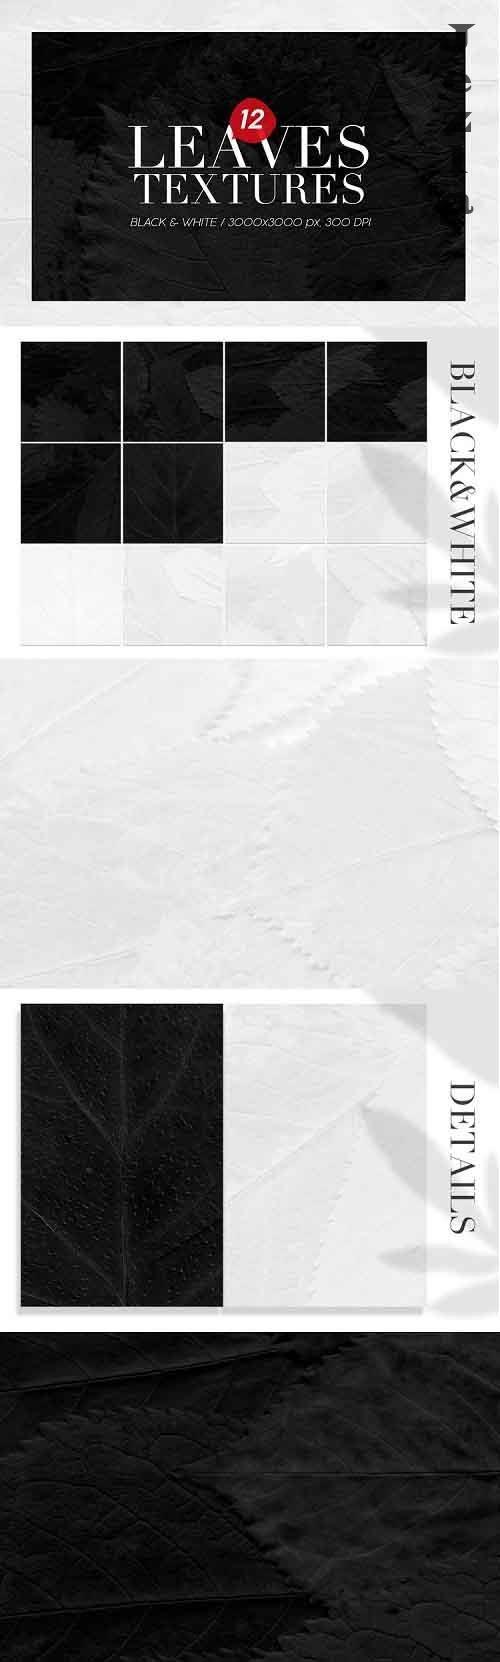 12 Black & White Leaves Textures - 800381